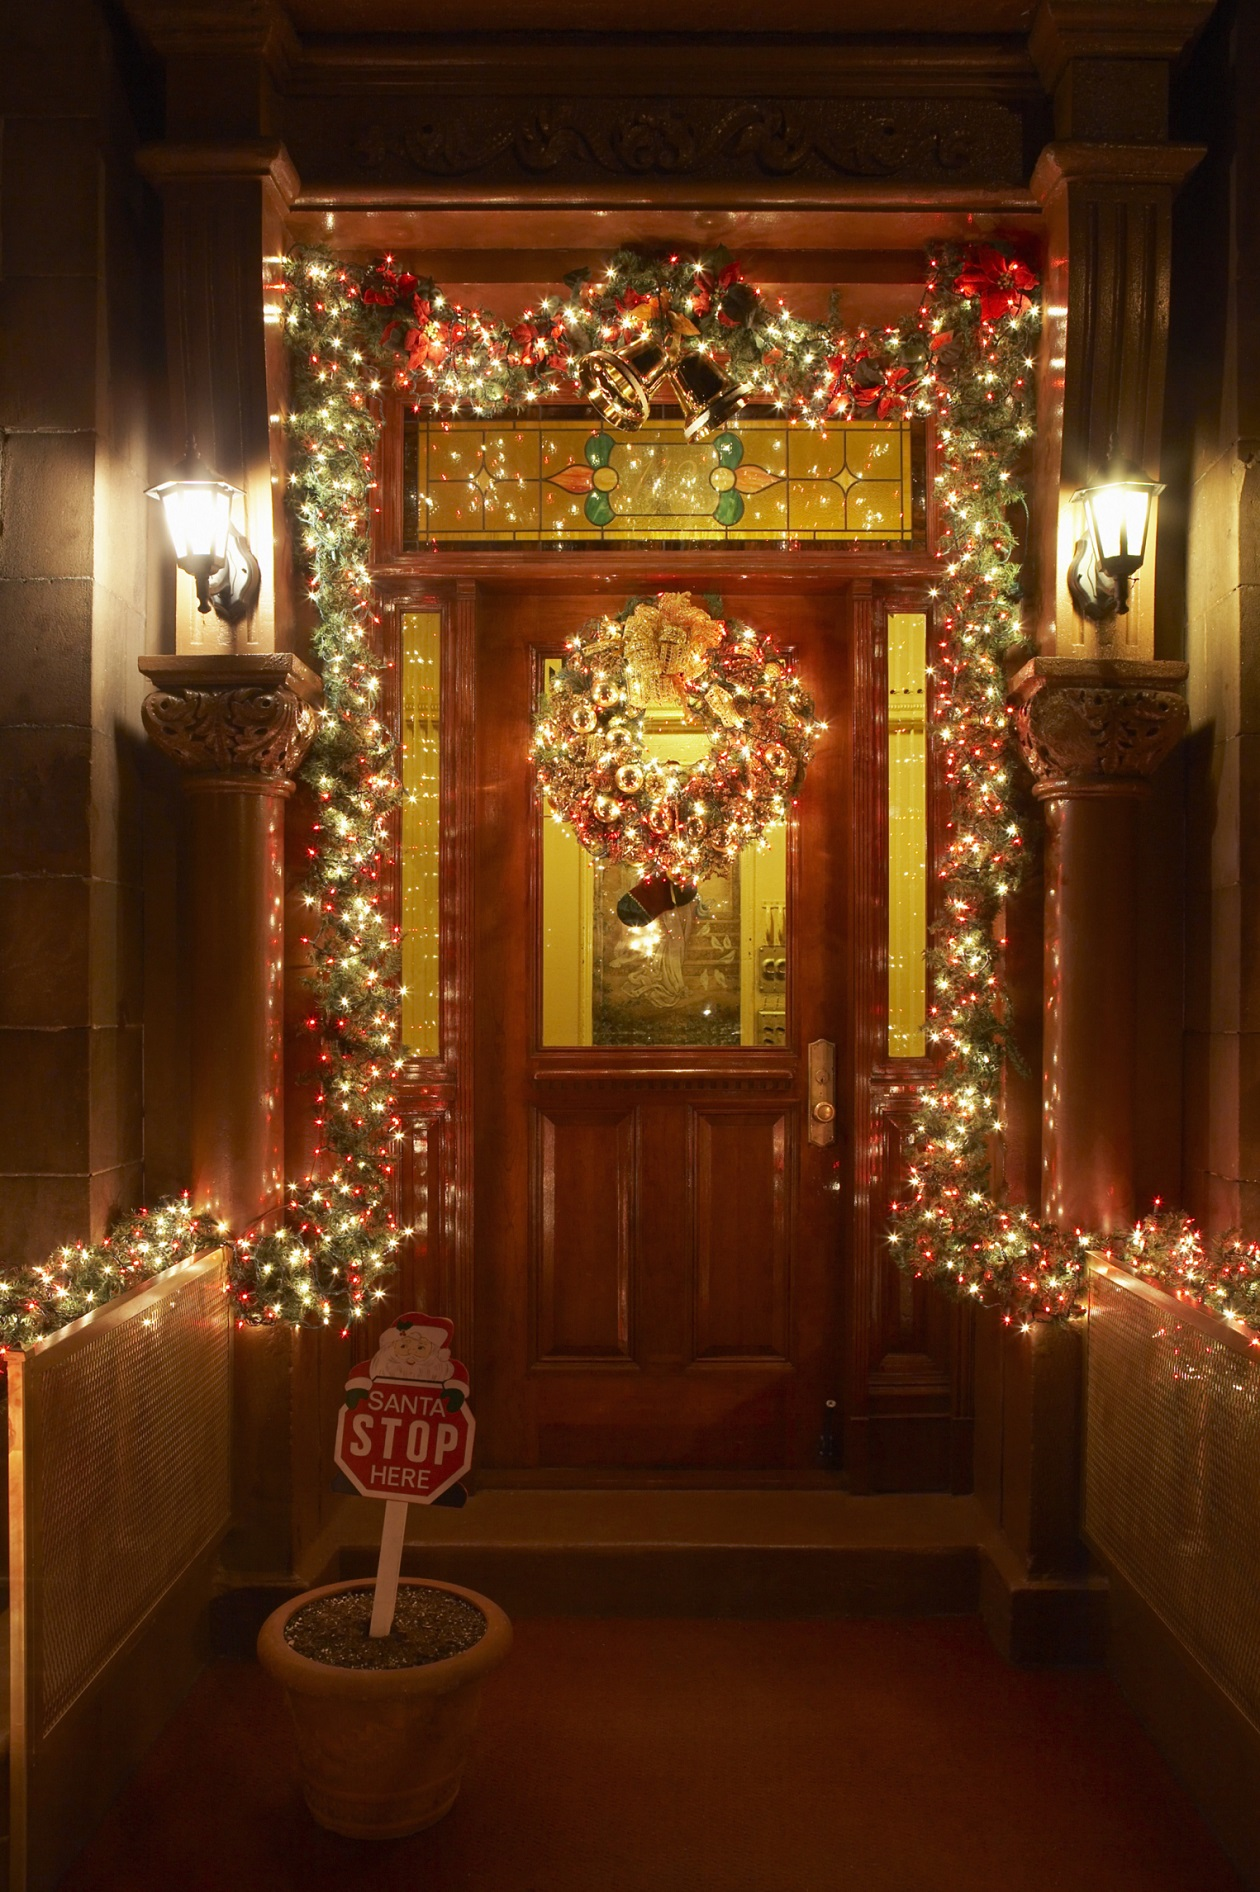 Diciembre 2015 blog madridecor for Decoracion casa navidad 2016